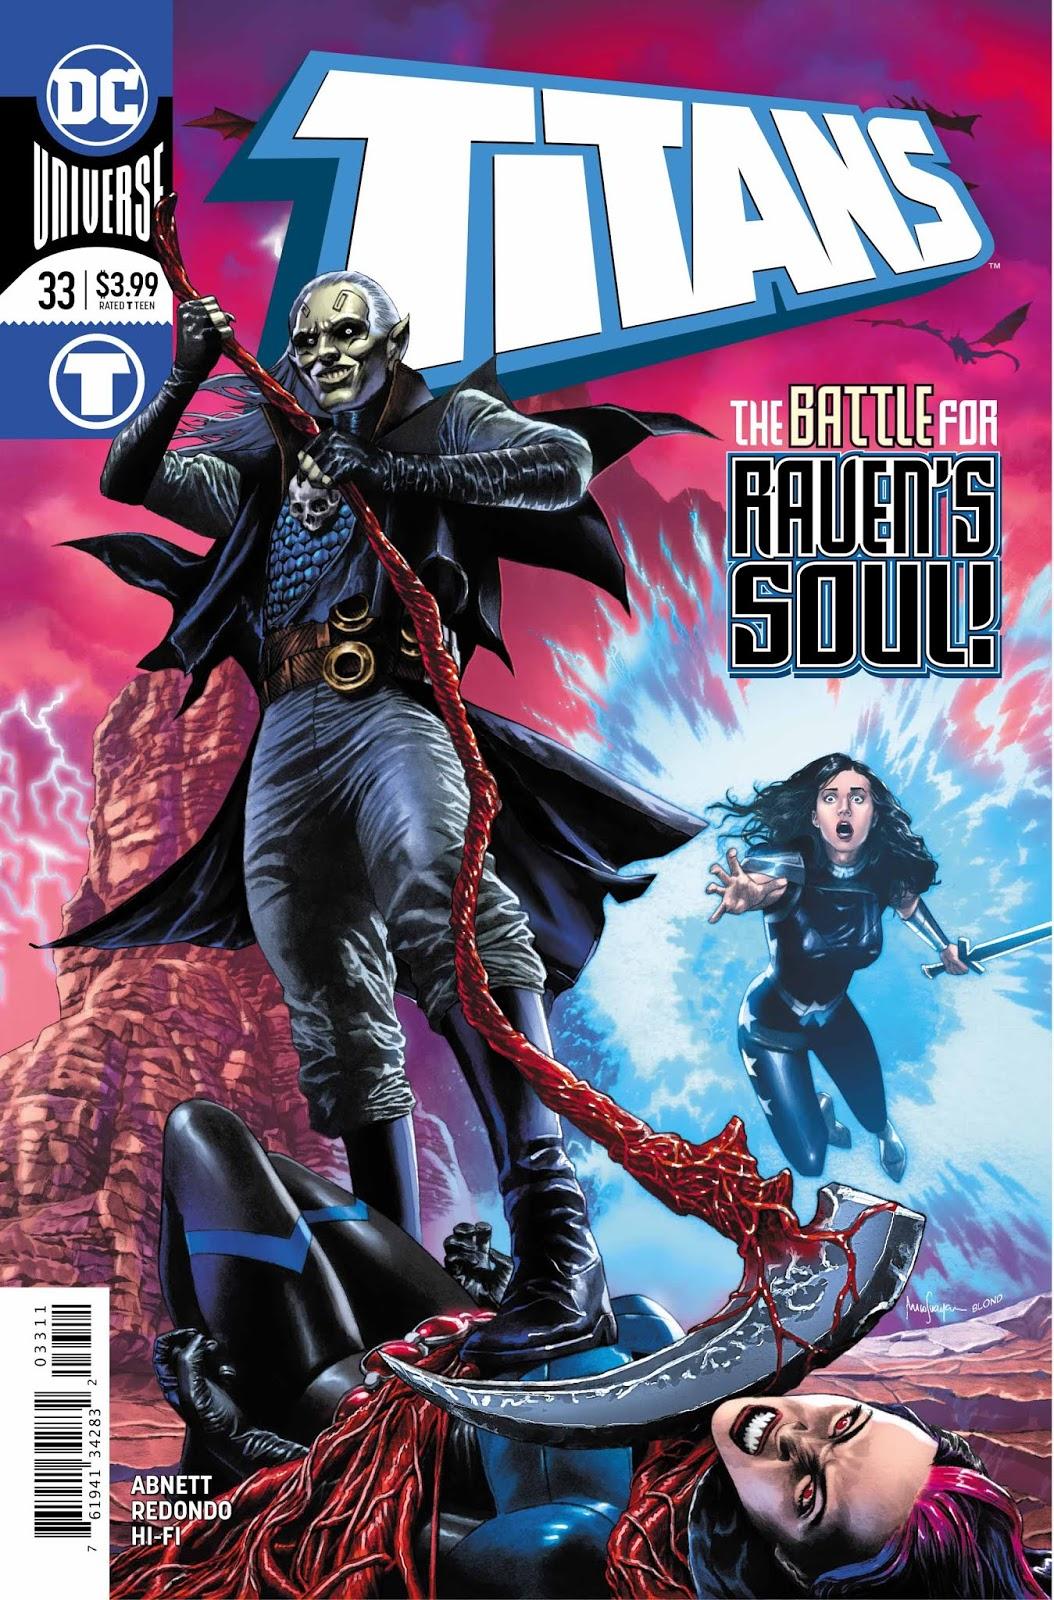 Weird Science DC Comics: PREVIEW: Titans #33